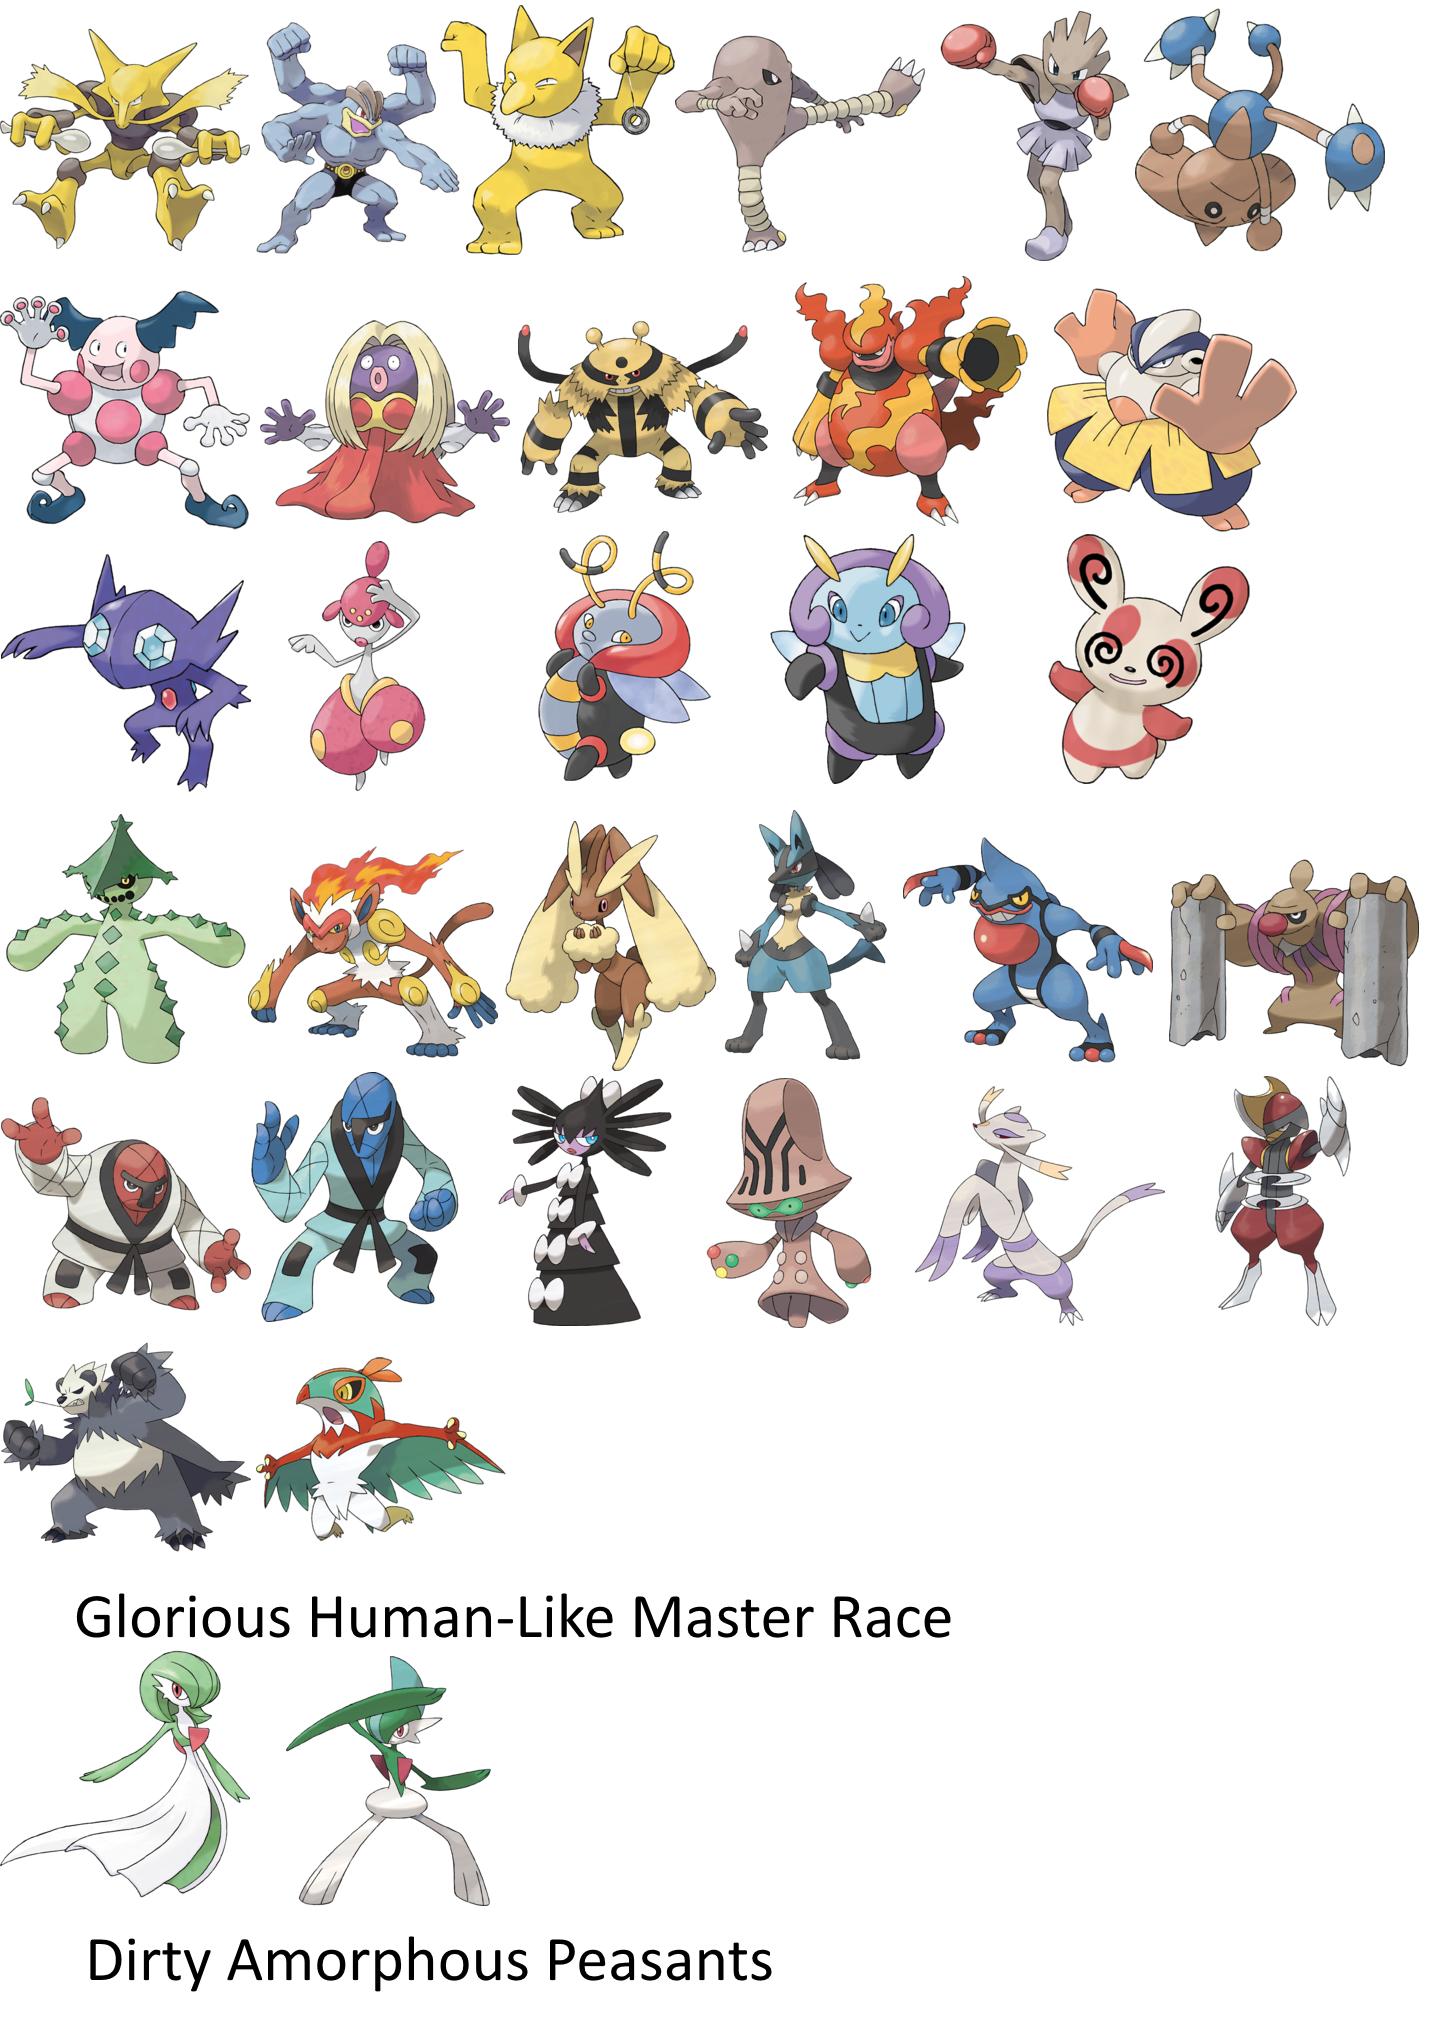 Glorious Human-Like Master Race | Pokémon | Know Your Meme